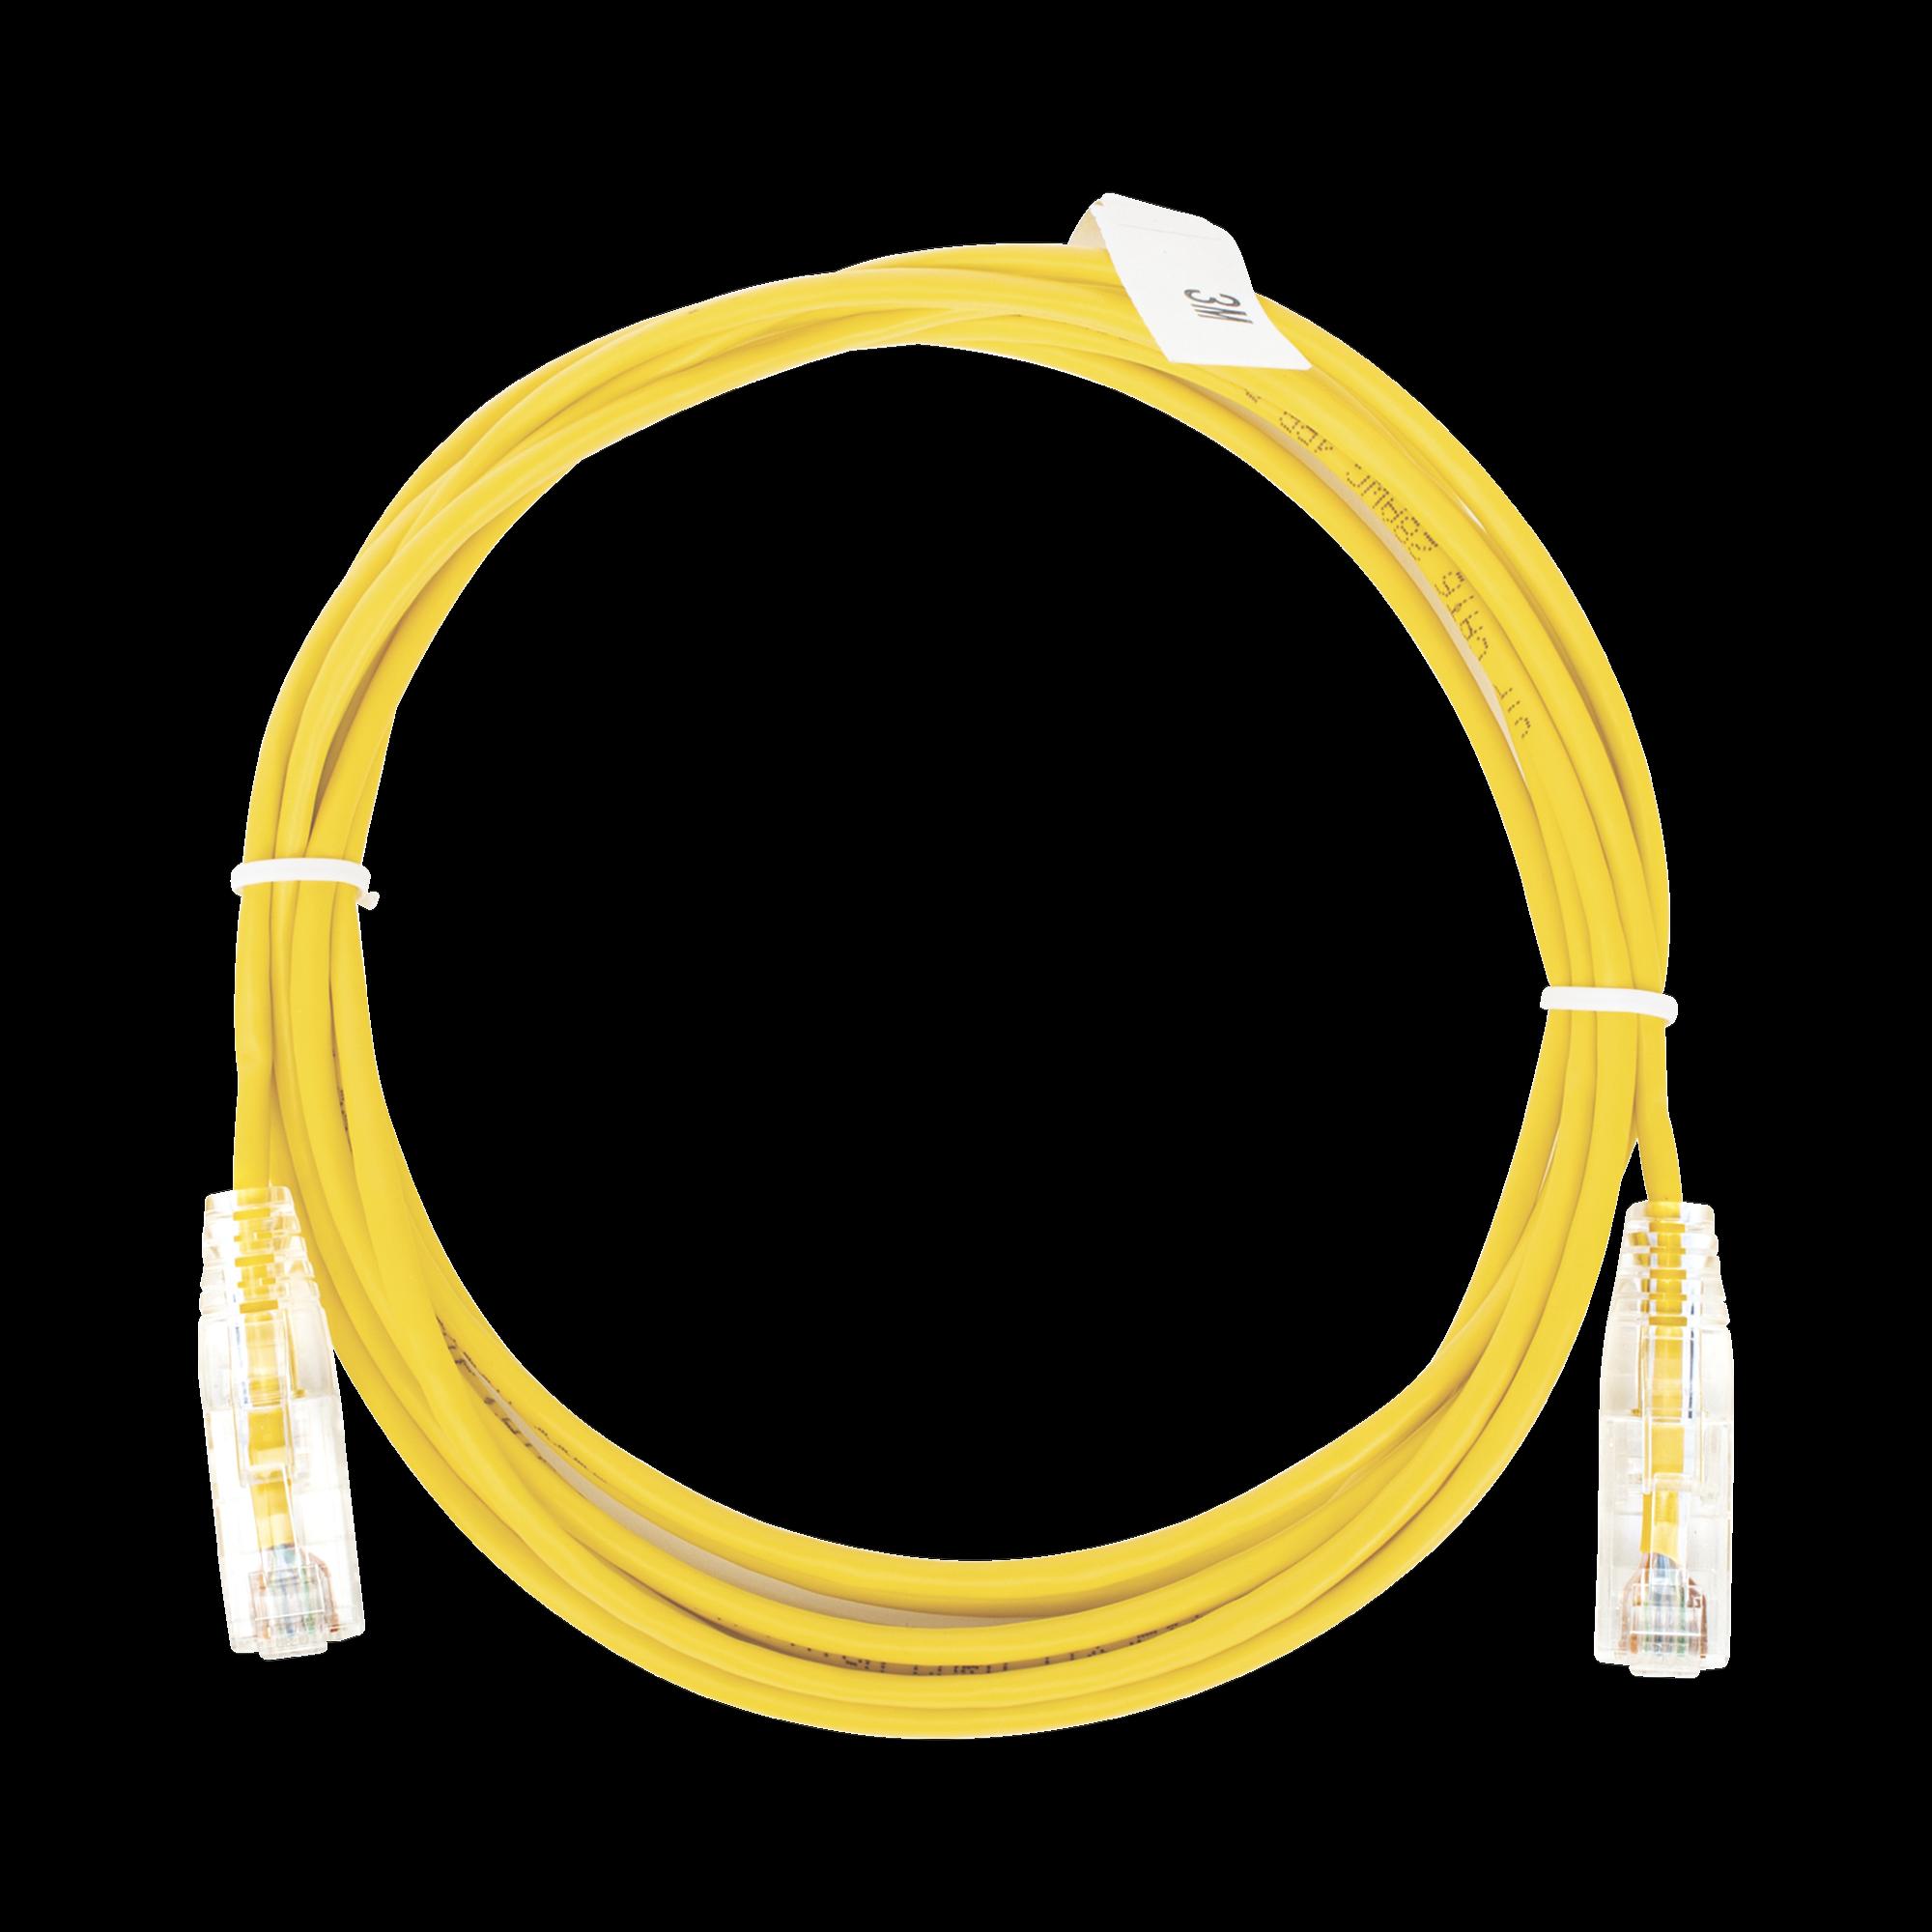 Cable de Parcheo Slim UTP Cat6 - 3 m Amarillo Diámetro Reducido (28 AWG)